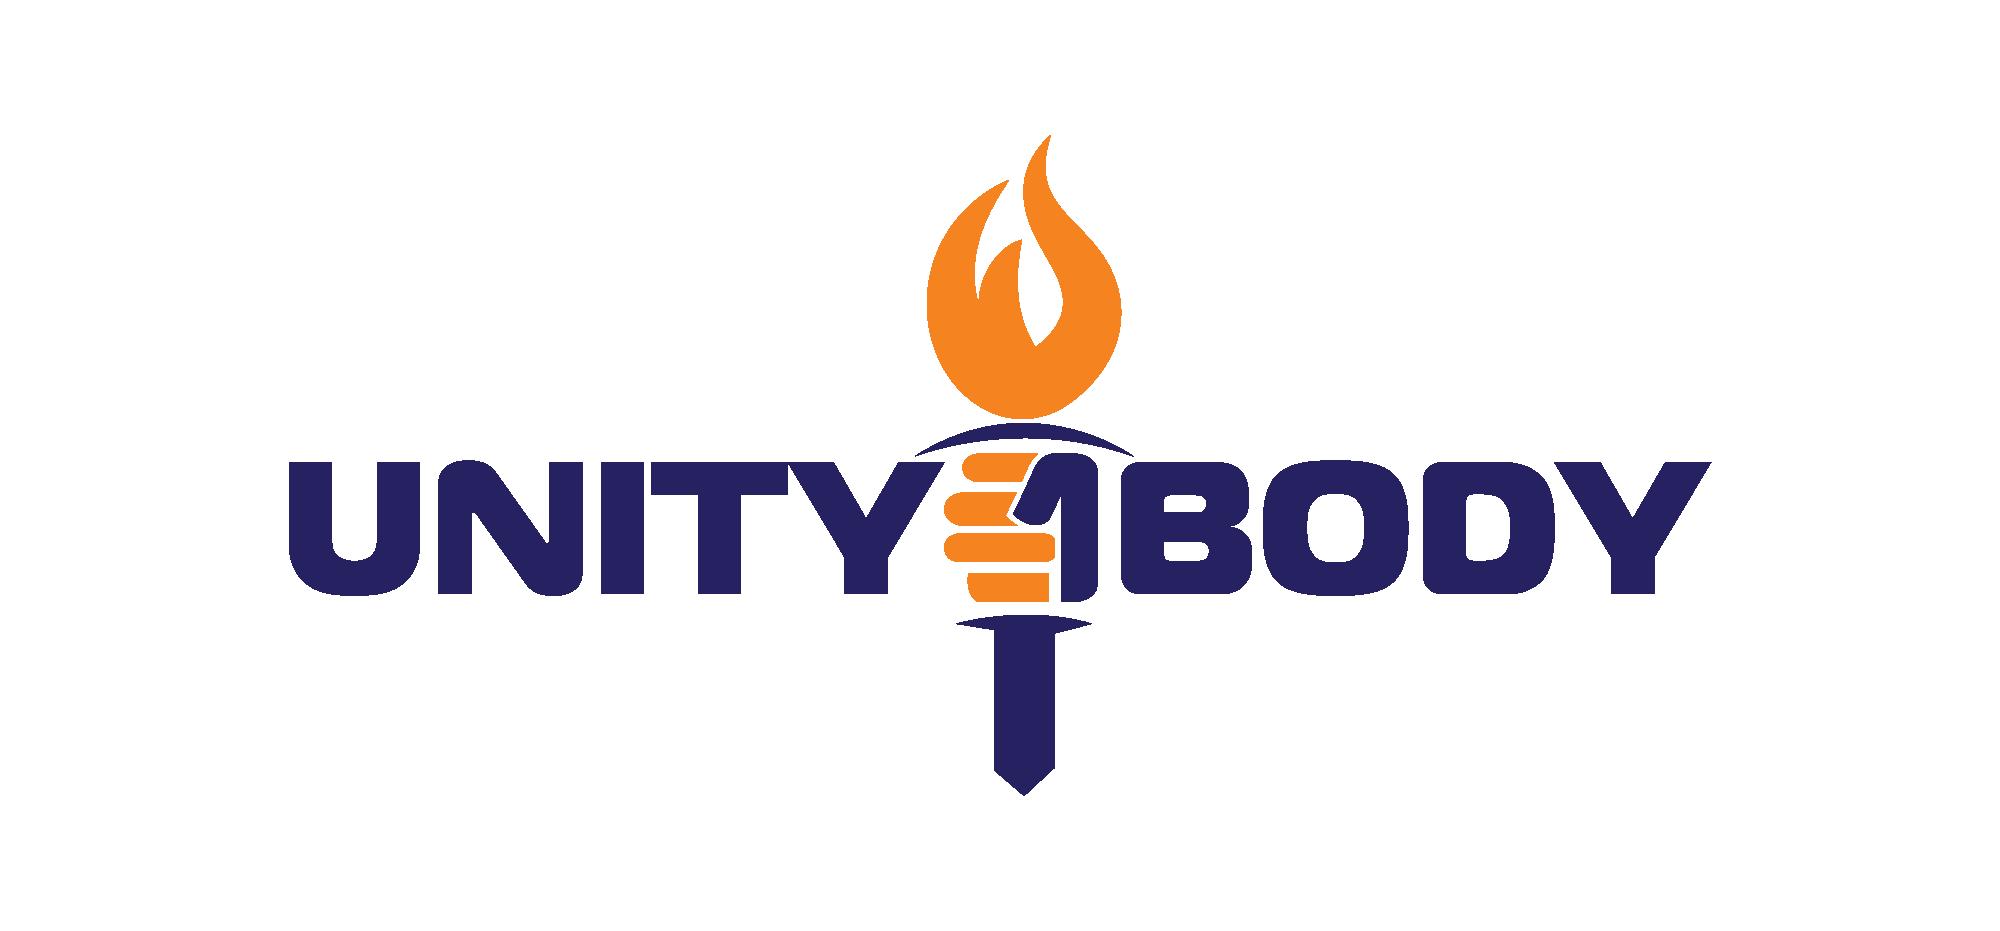 Unity1body